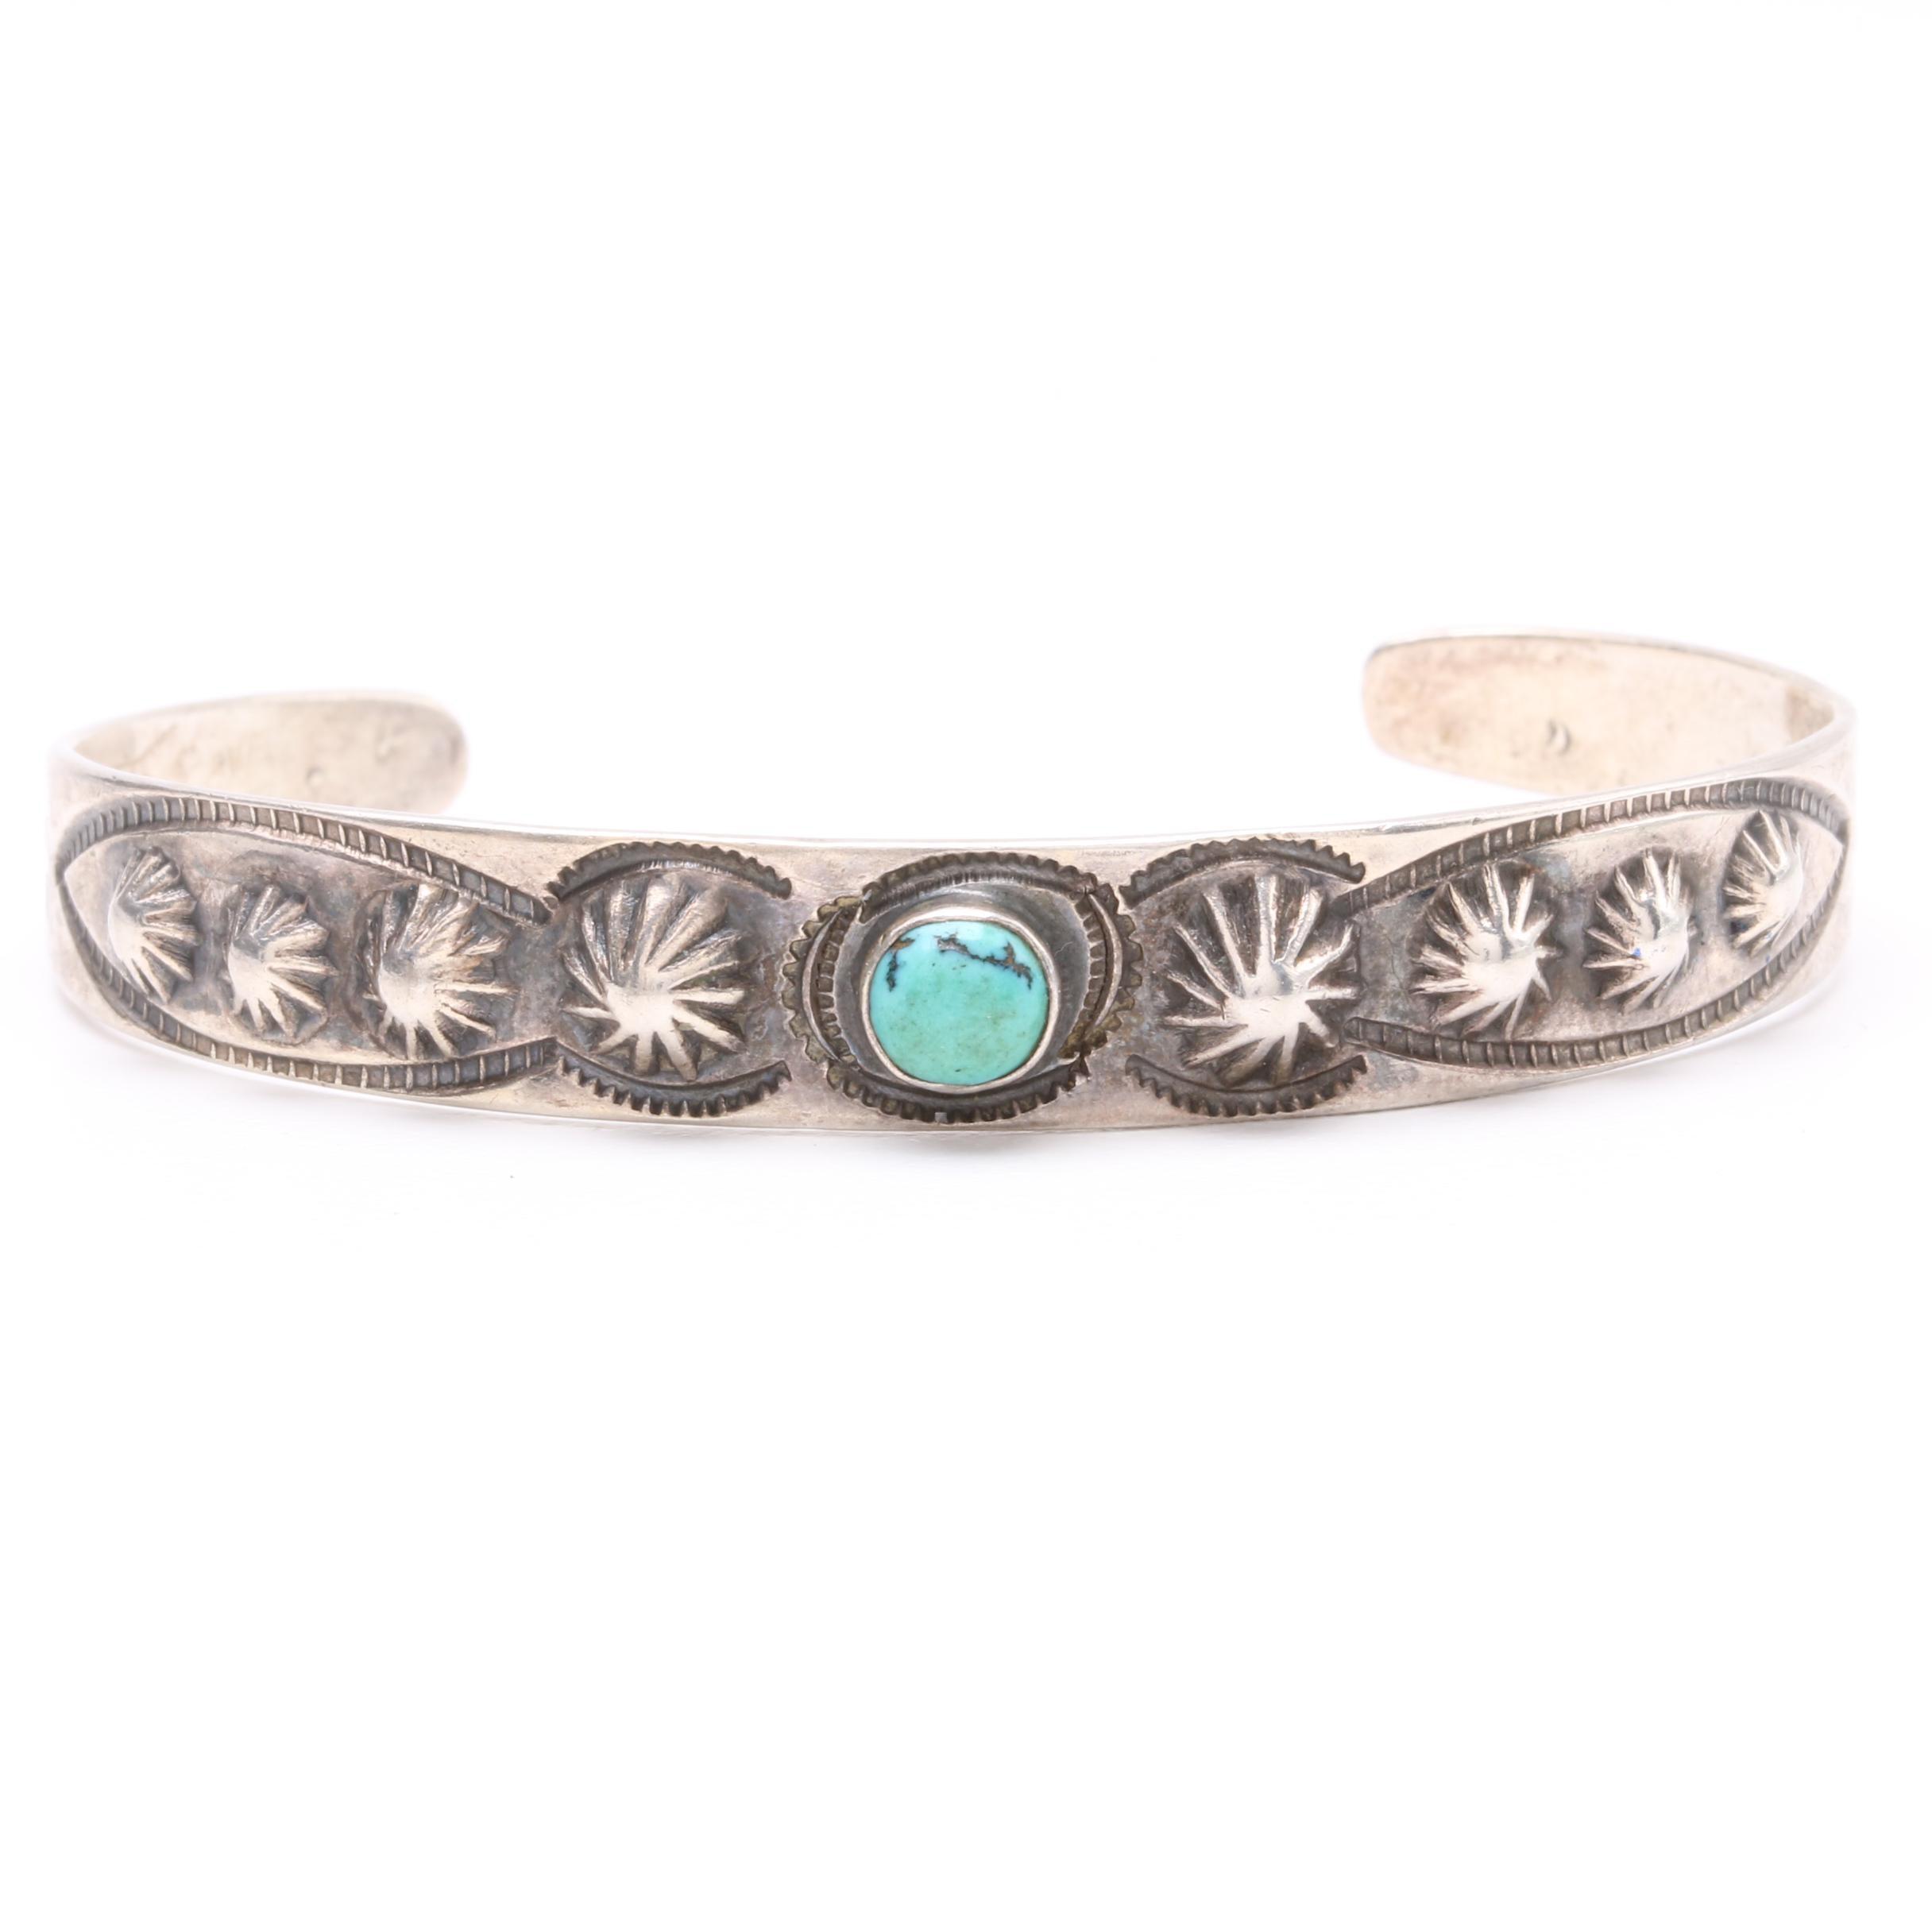 1920s Fred Harvey Southwestern Style Sterling Silver Turquoise Cuff Bracelet